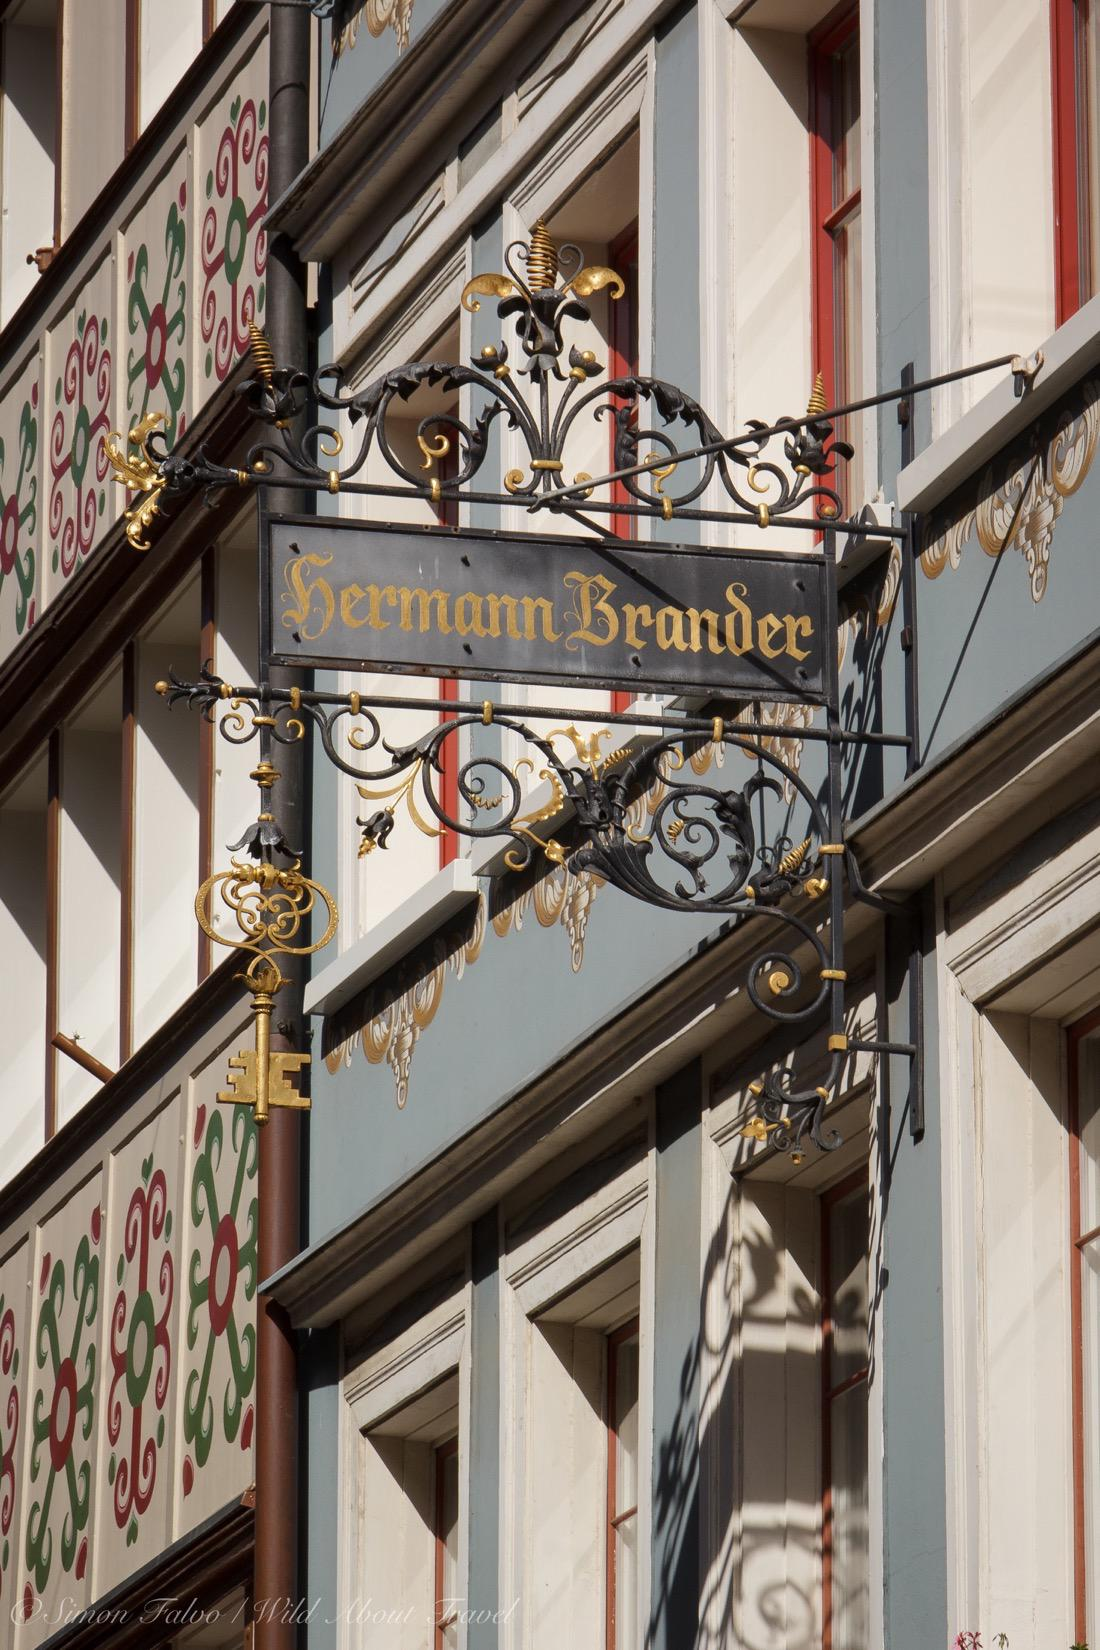 Appenzell Hermann Brander